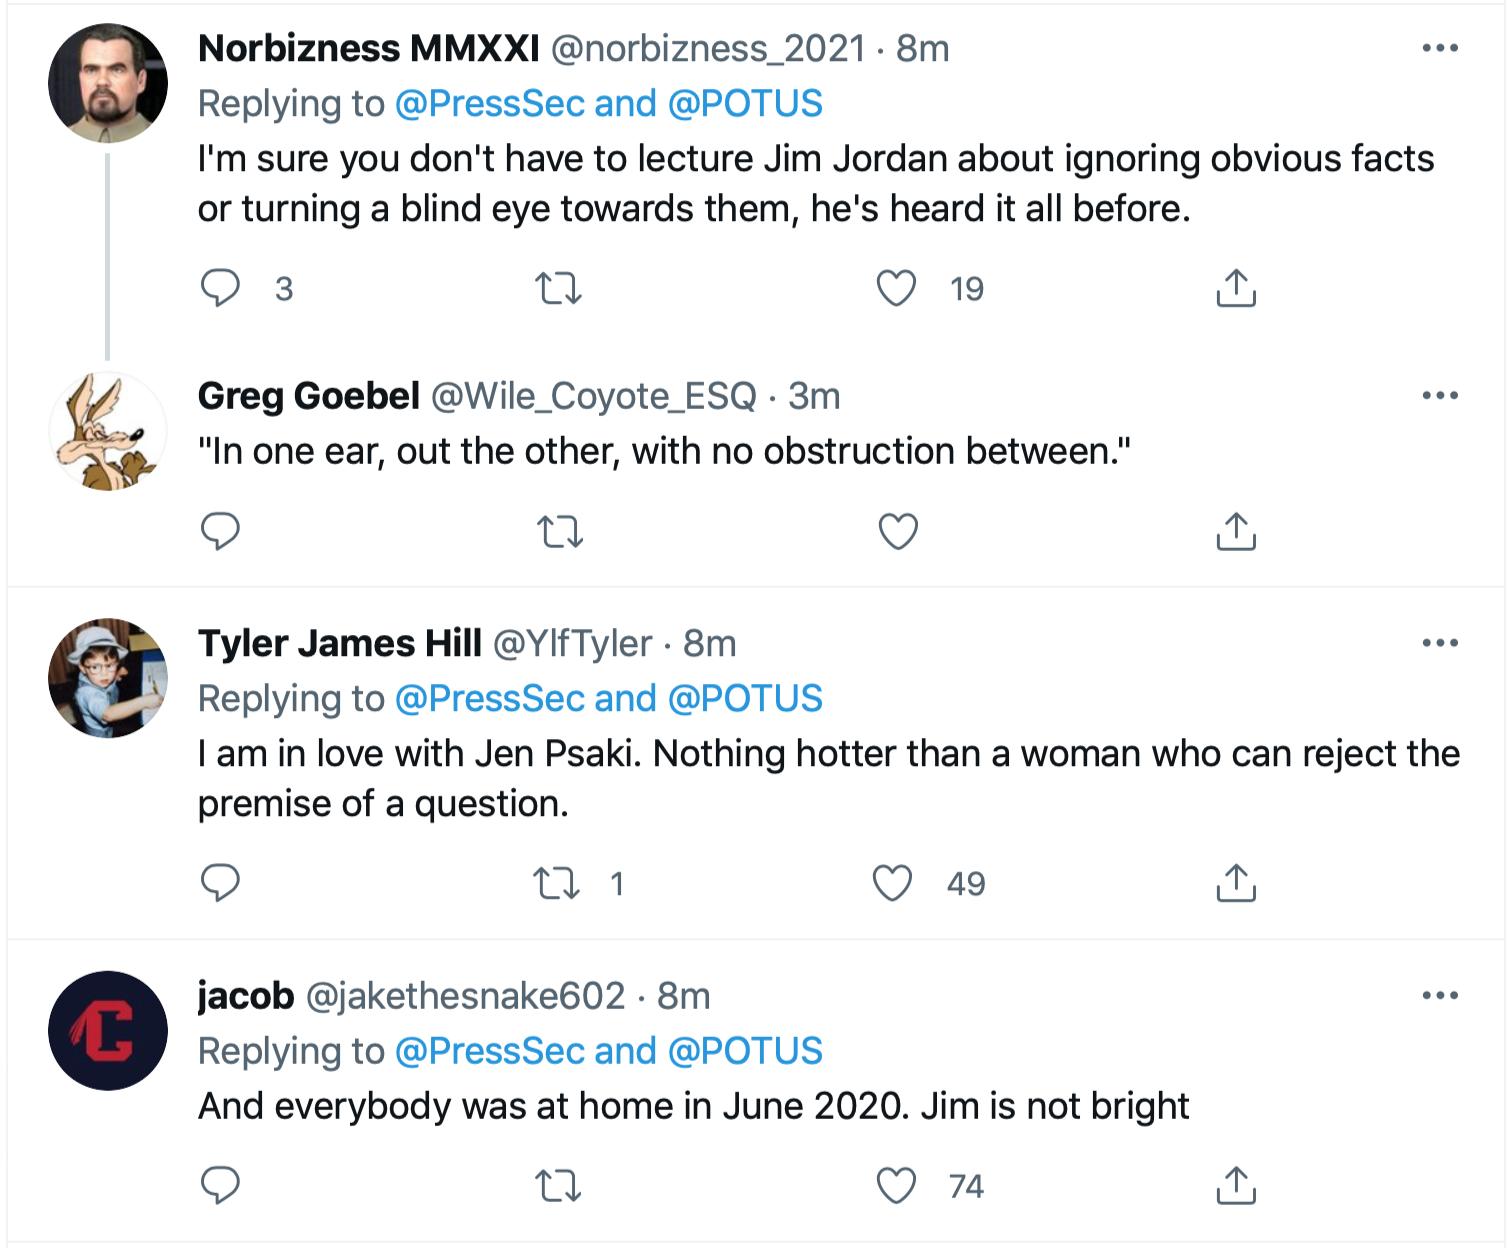 Screen-Shot-2021-06-21-at-12.55.33-PM Jen Psaki Makes Jim Jordan Look Even Dumber Than Usual Economy Featured Joe Biden Politics Top Stories Twitter